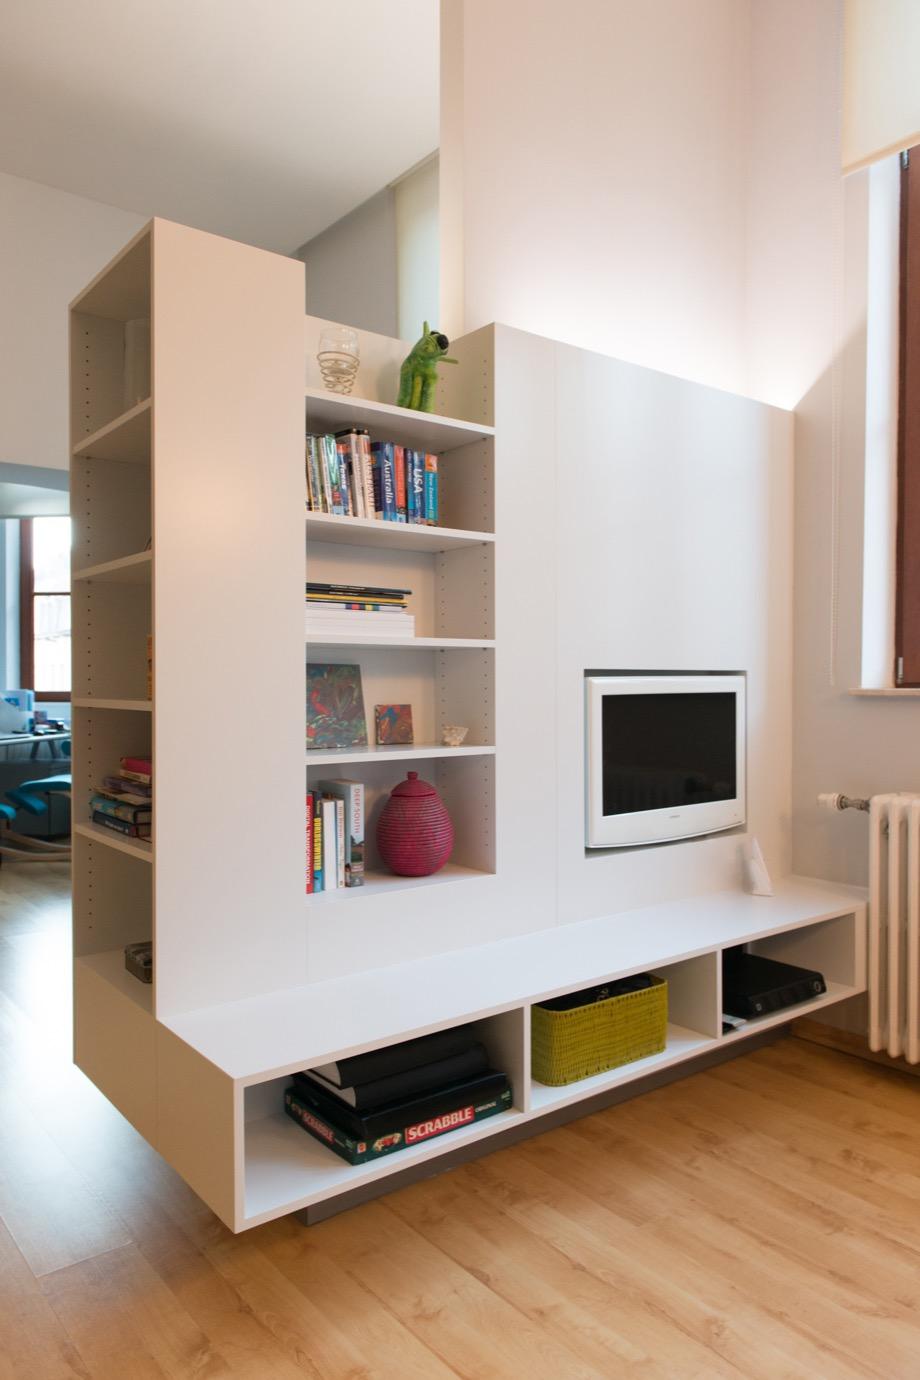 Verrassend Scheidingswand keuken – zitkamer – Berchem | Kastenlab AL-99